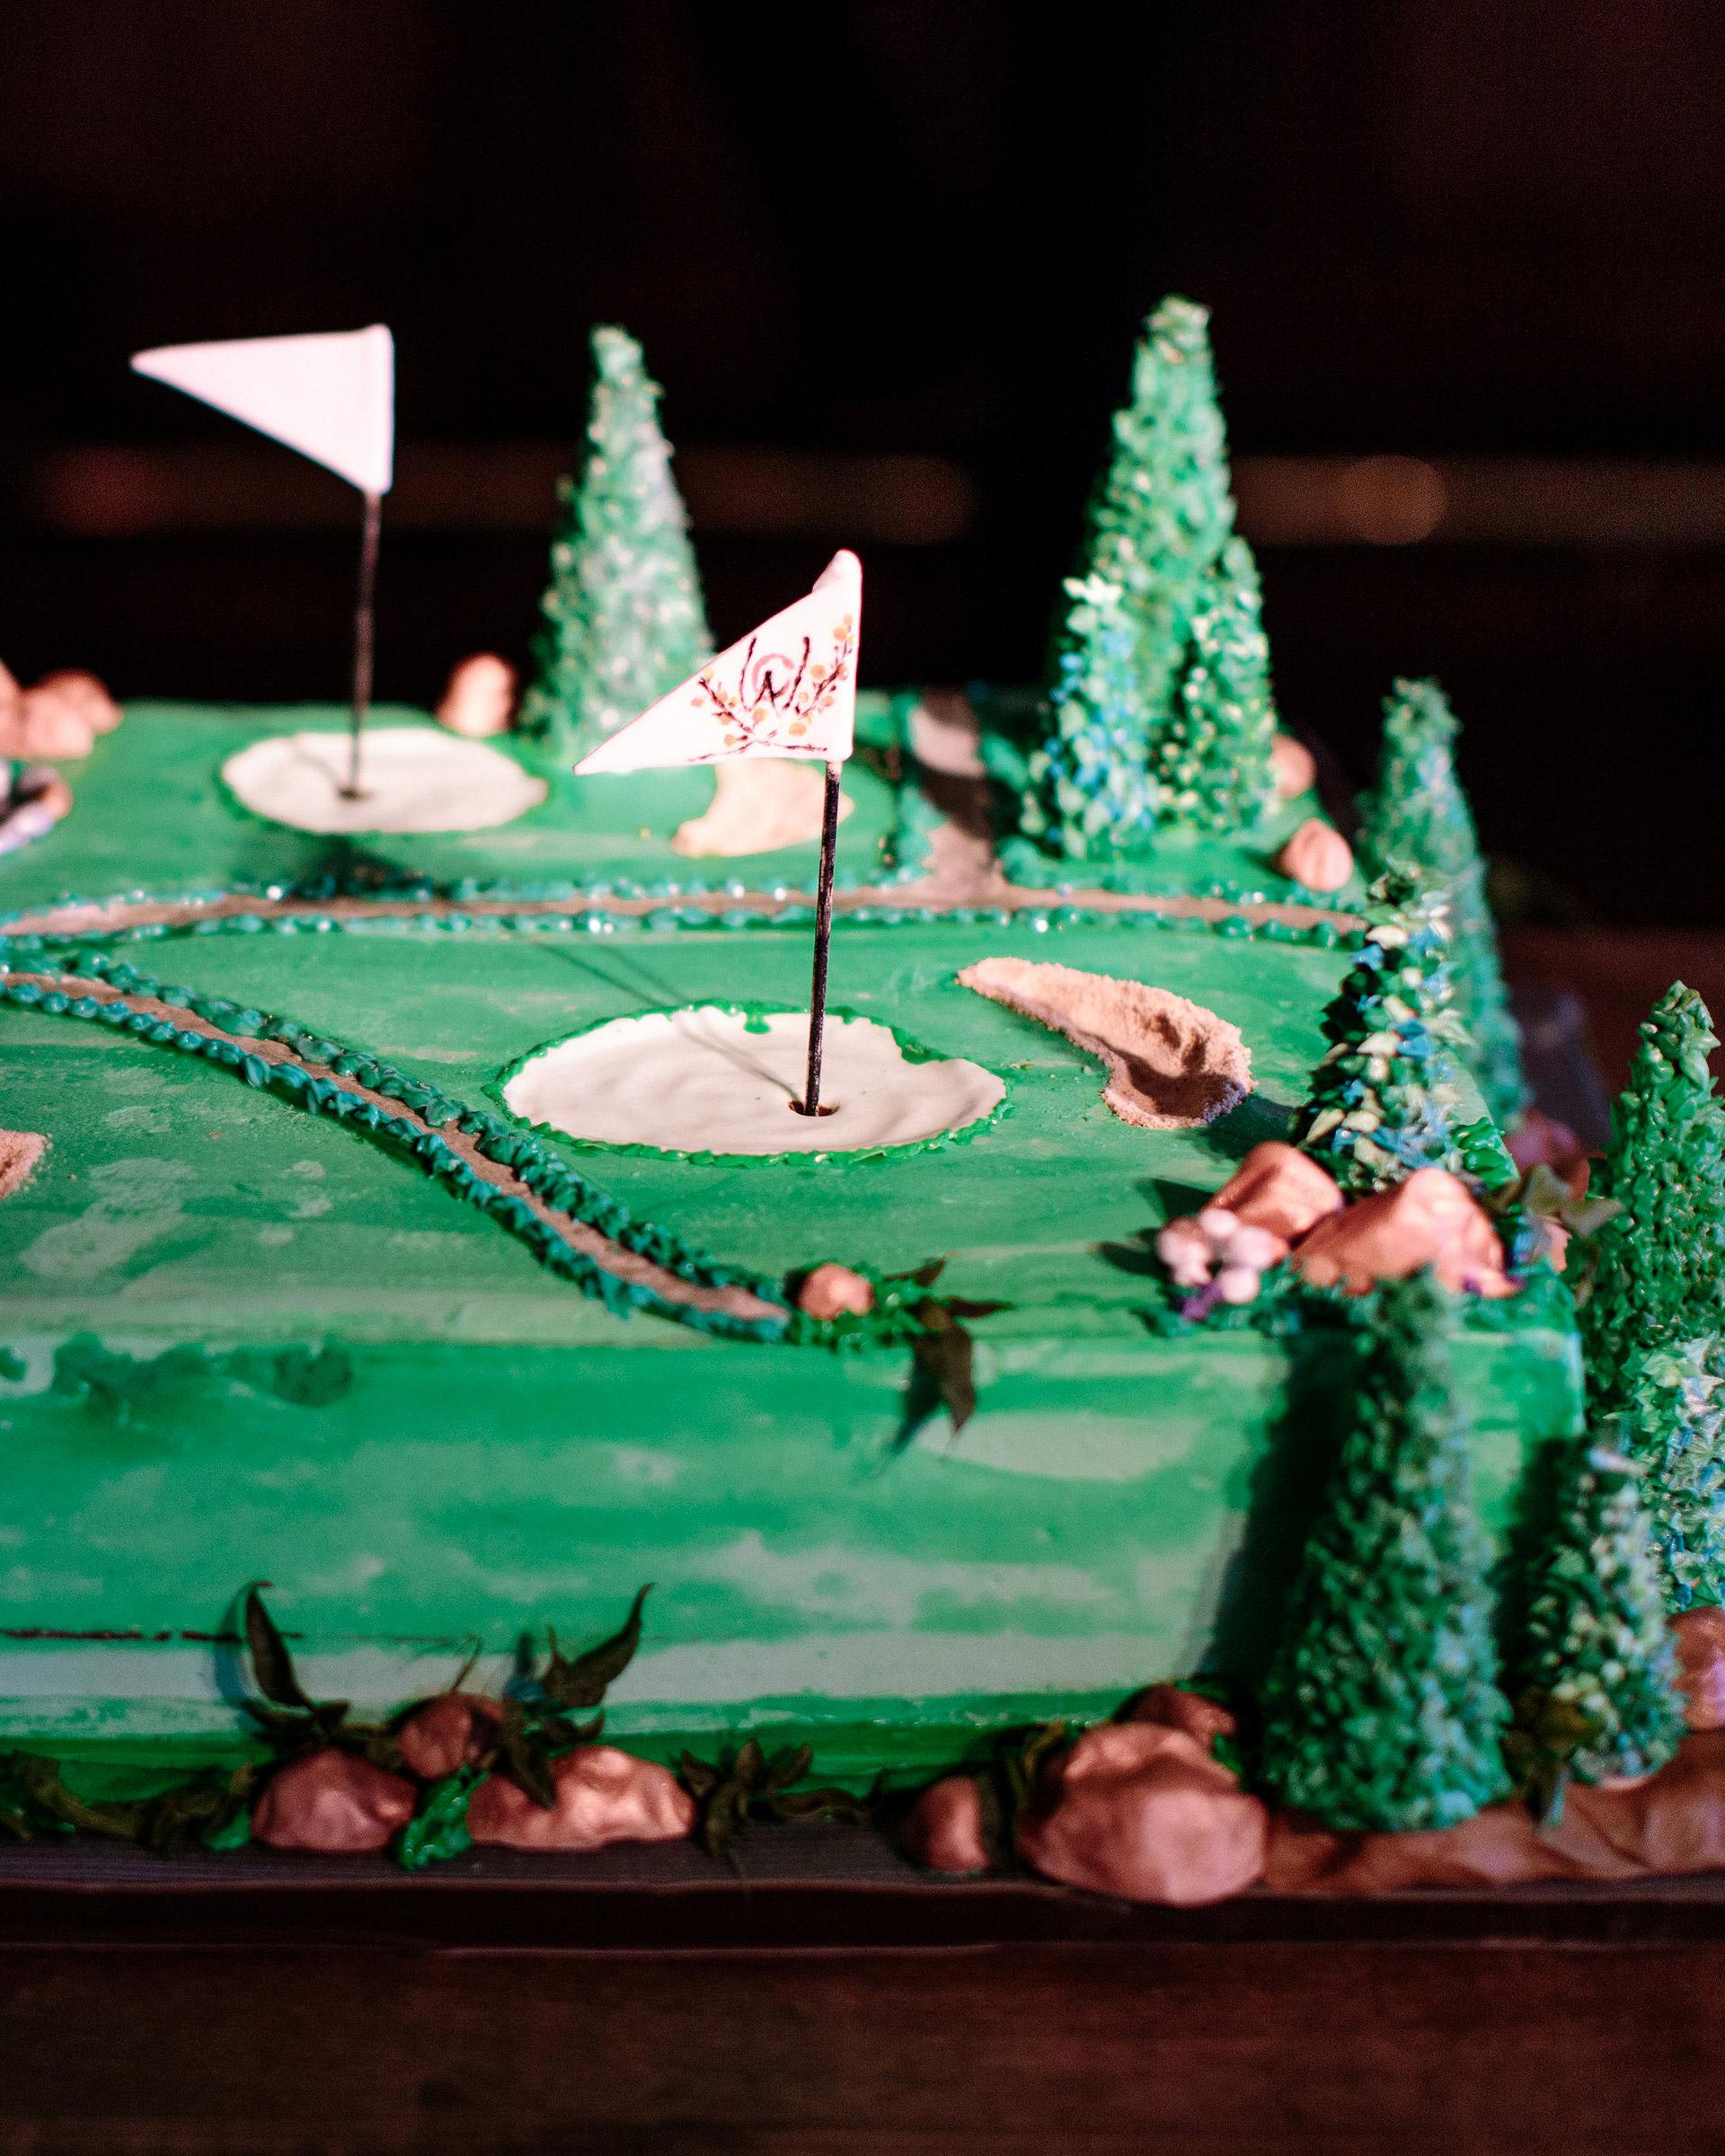 grooms cake golf